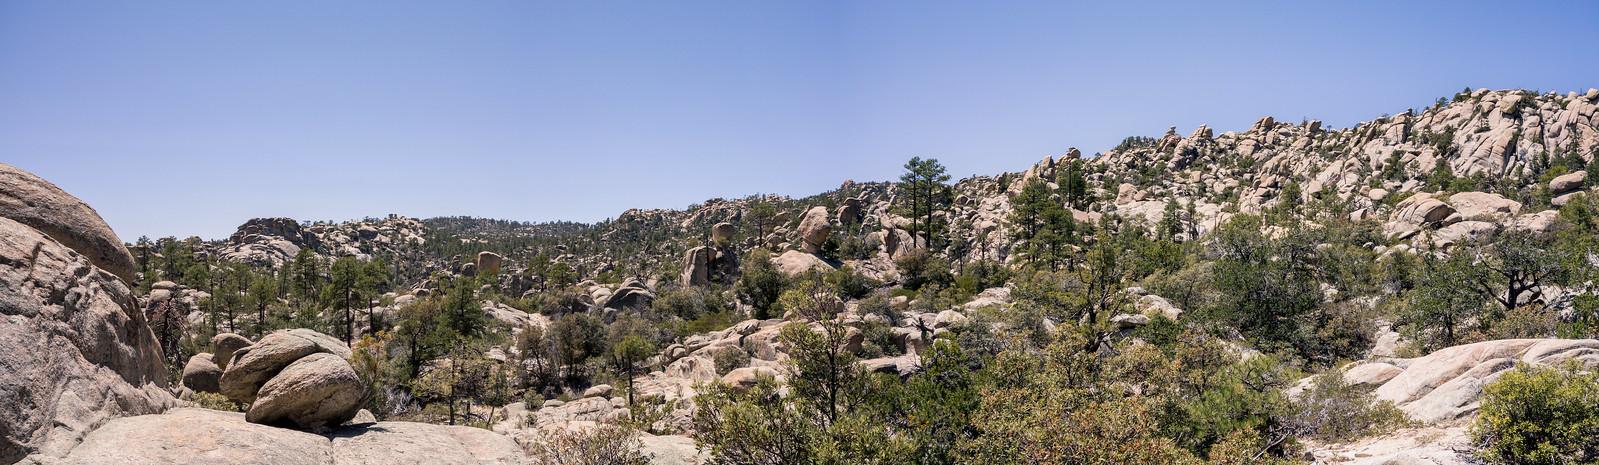 1404 Wilderness of Rocks